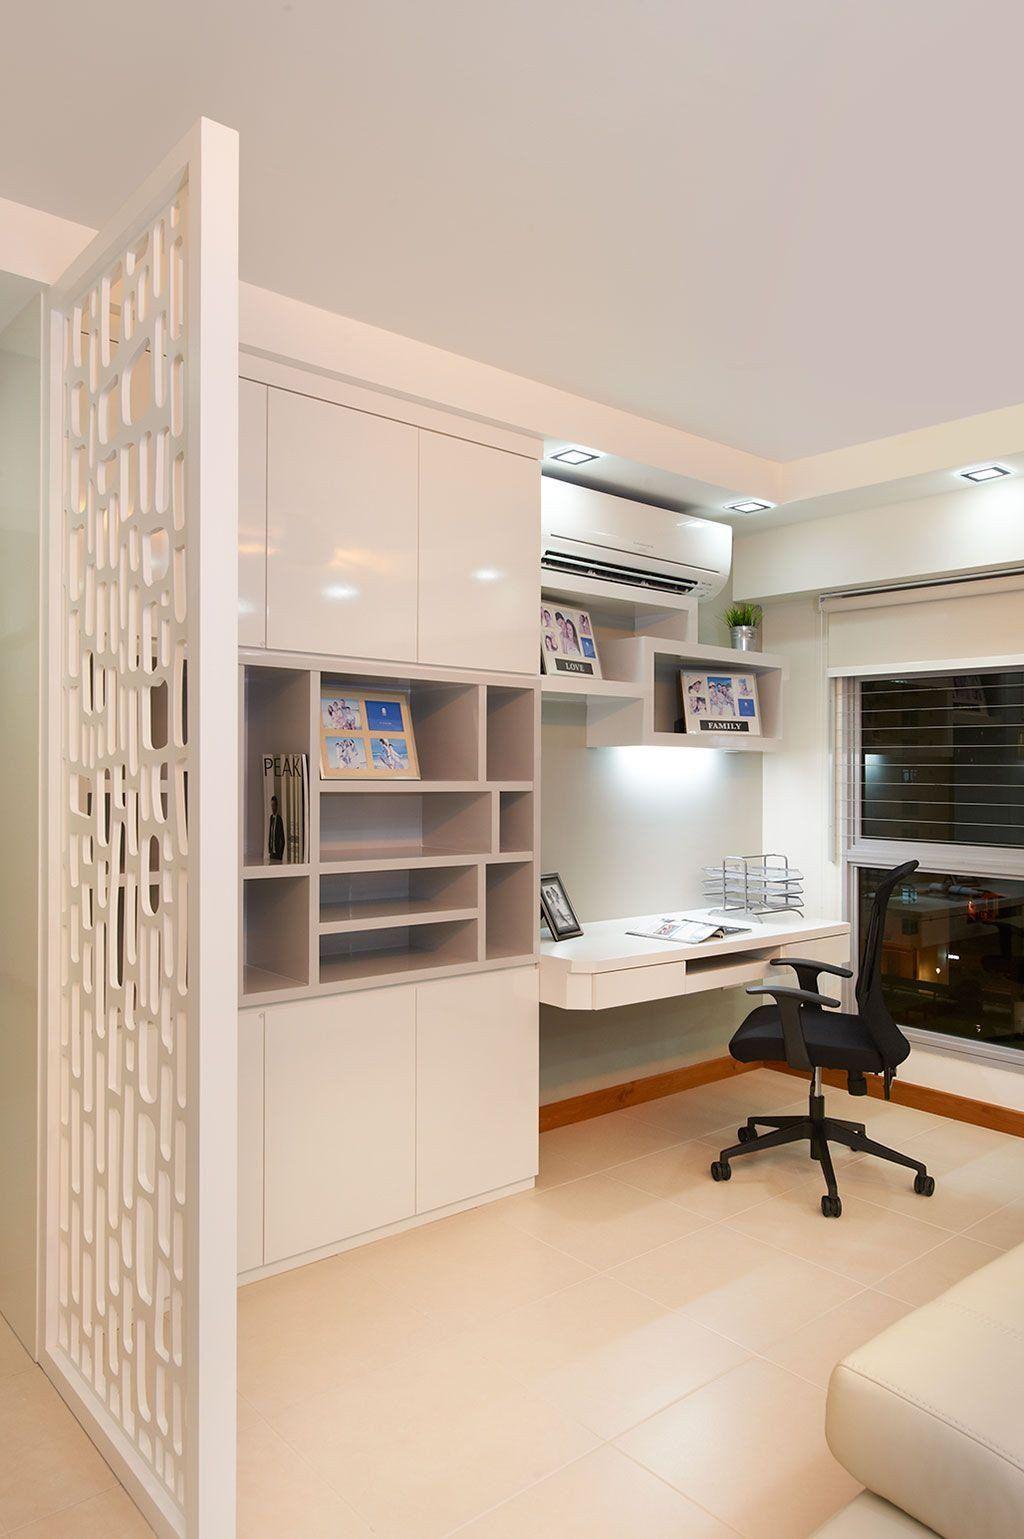 Renovation Ideas For 4a Hdb Living Room: Pin On Popular Bedroom Layout Ideas